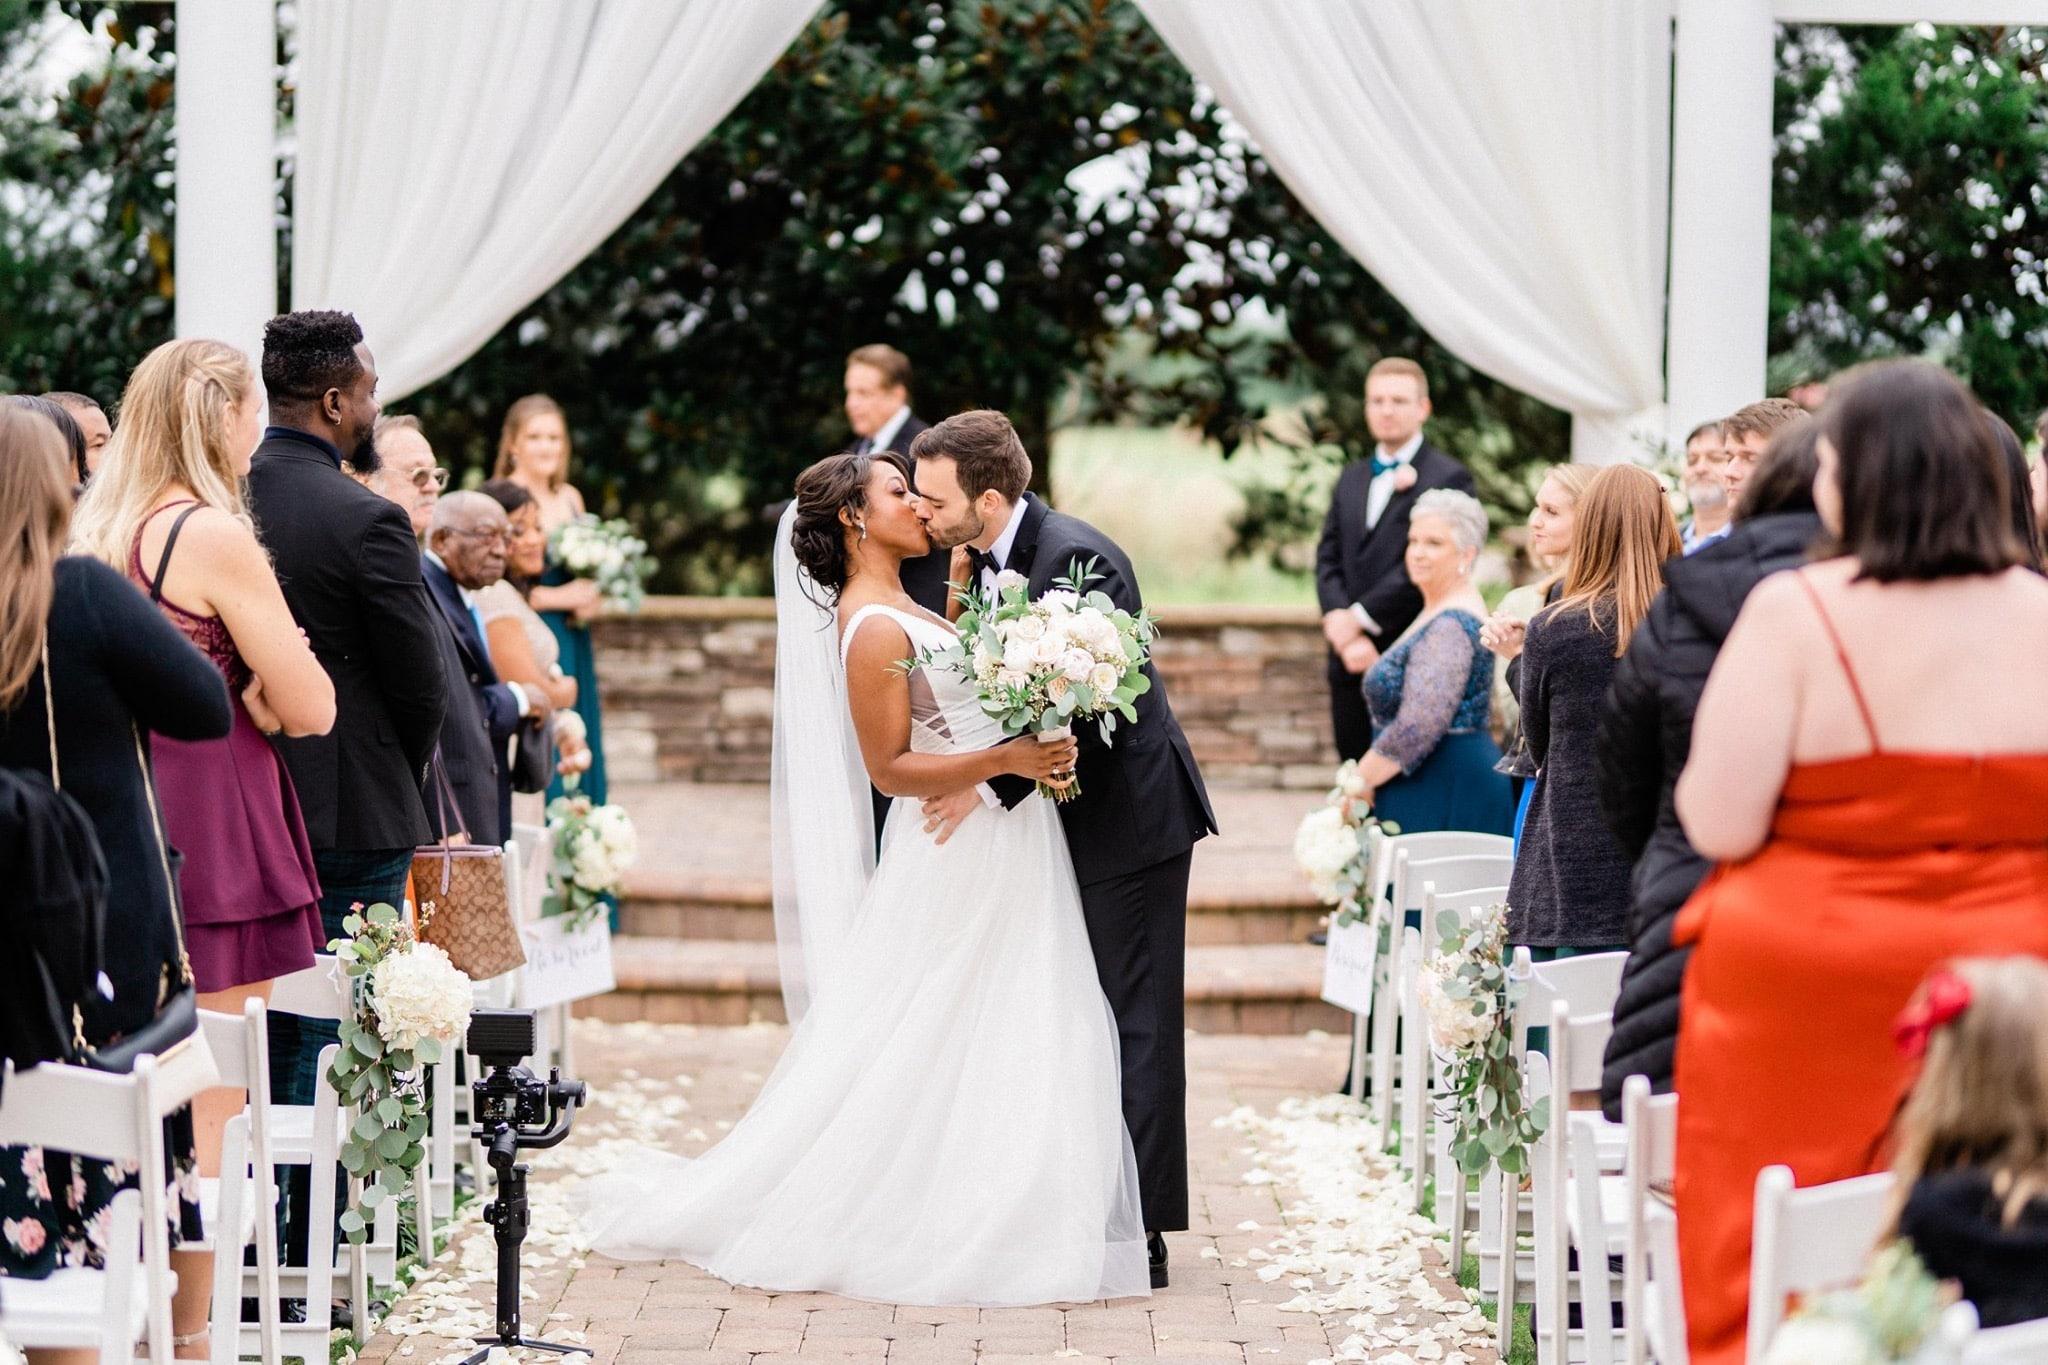 black bride and white groom interracial couple wedding ceremony florida